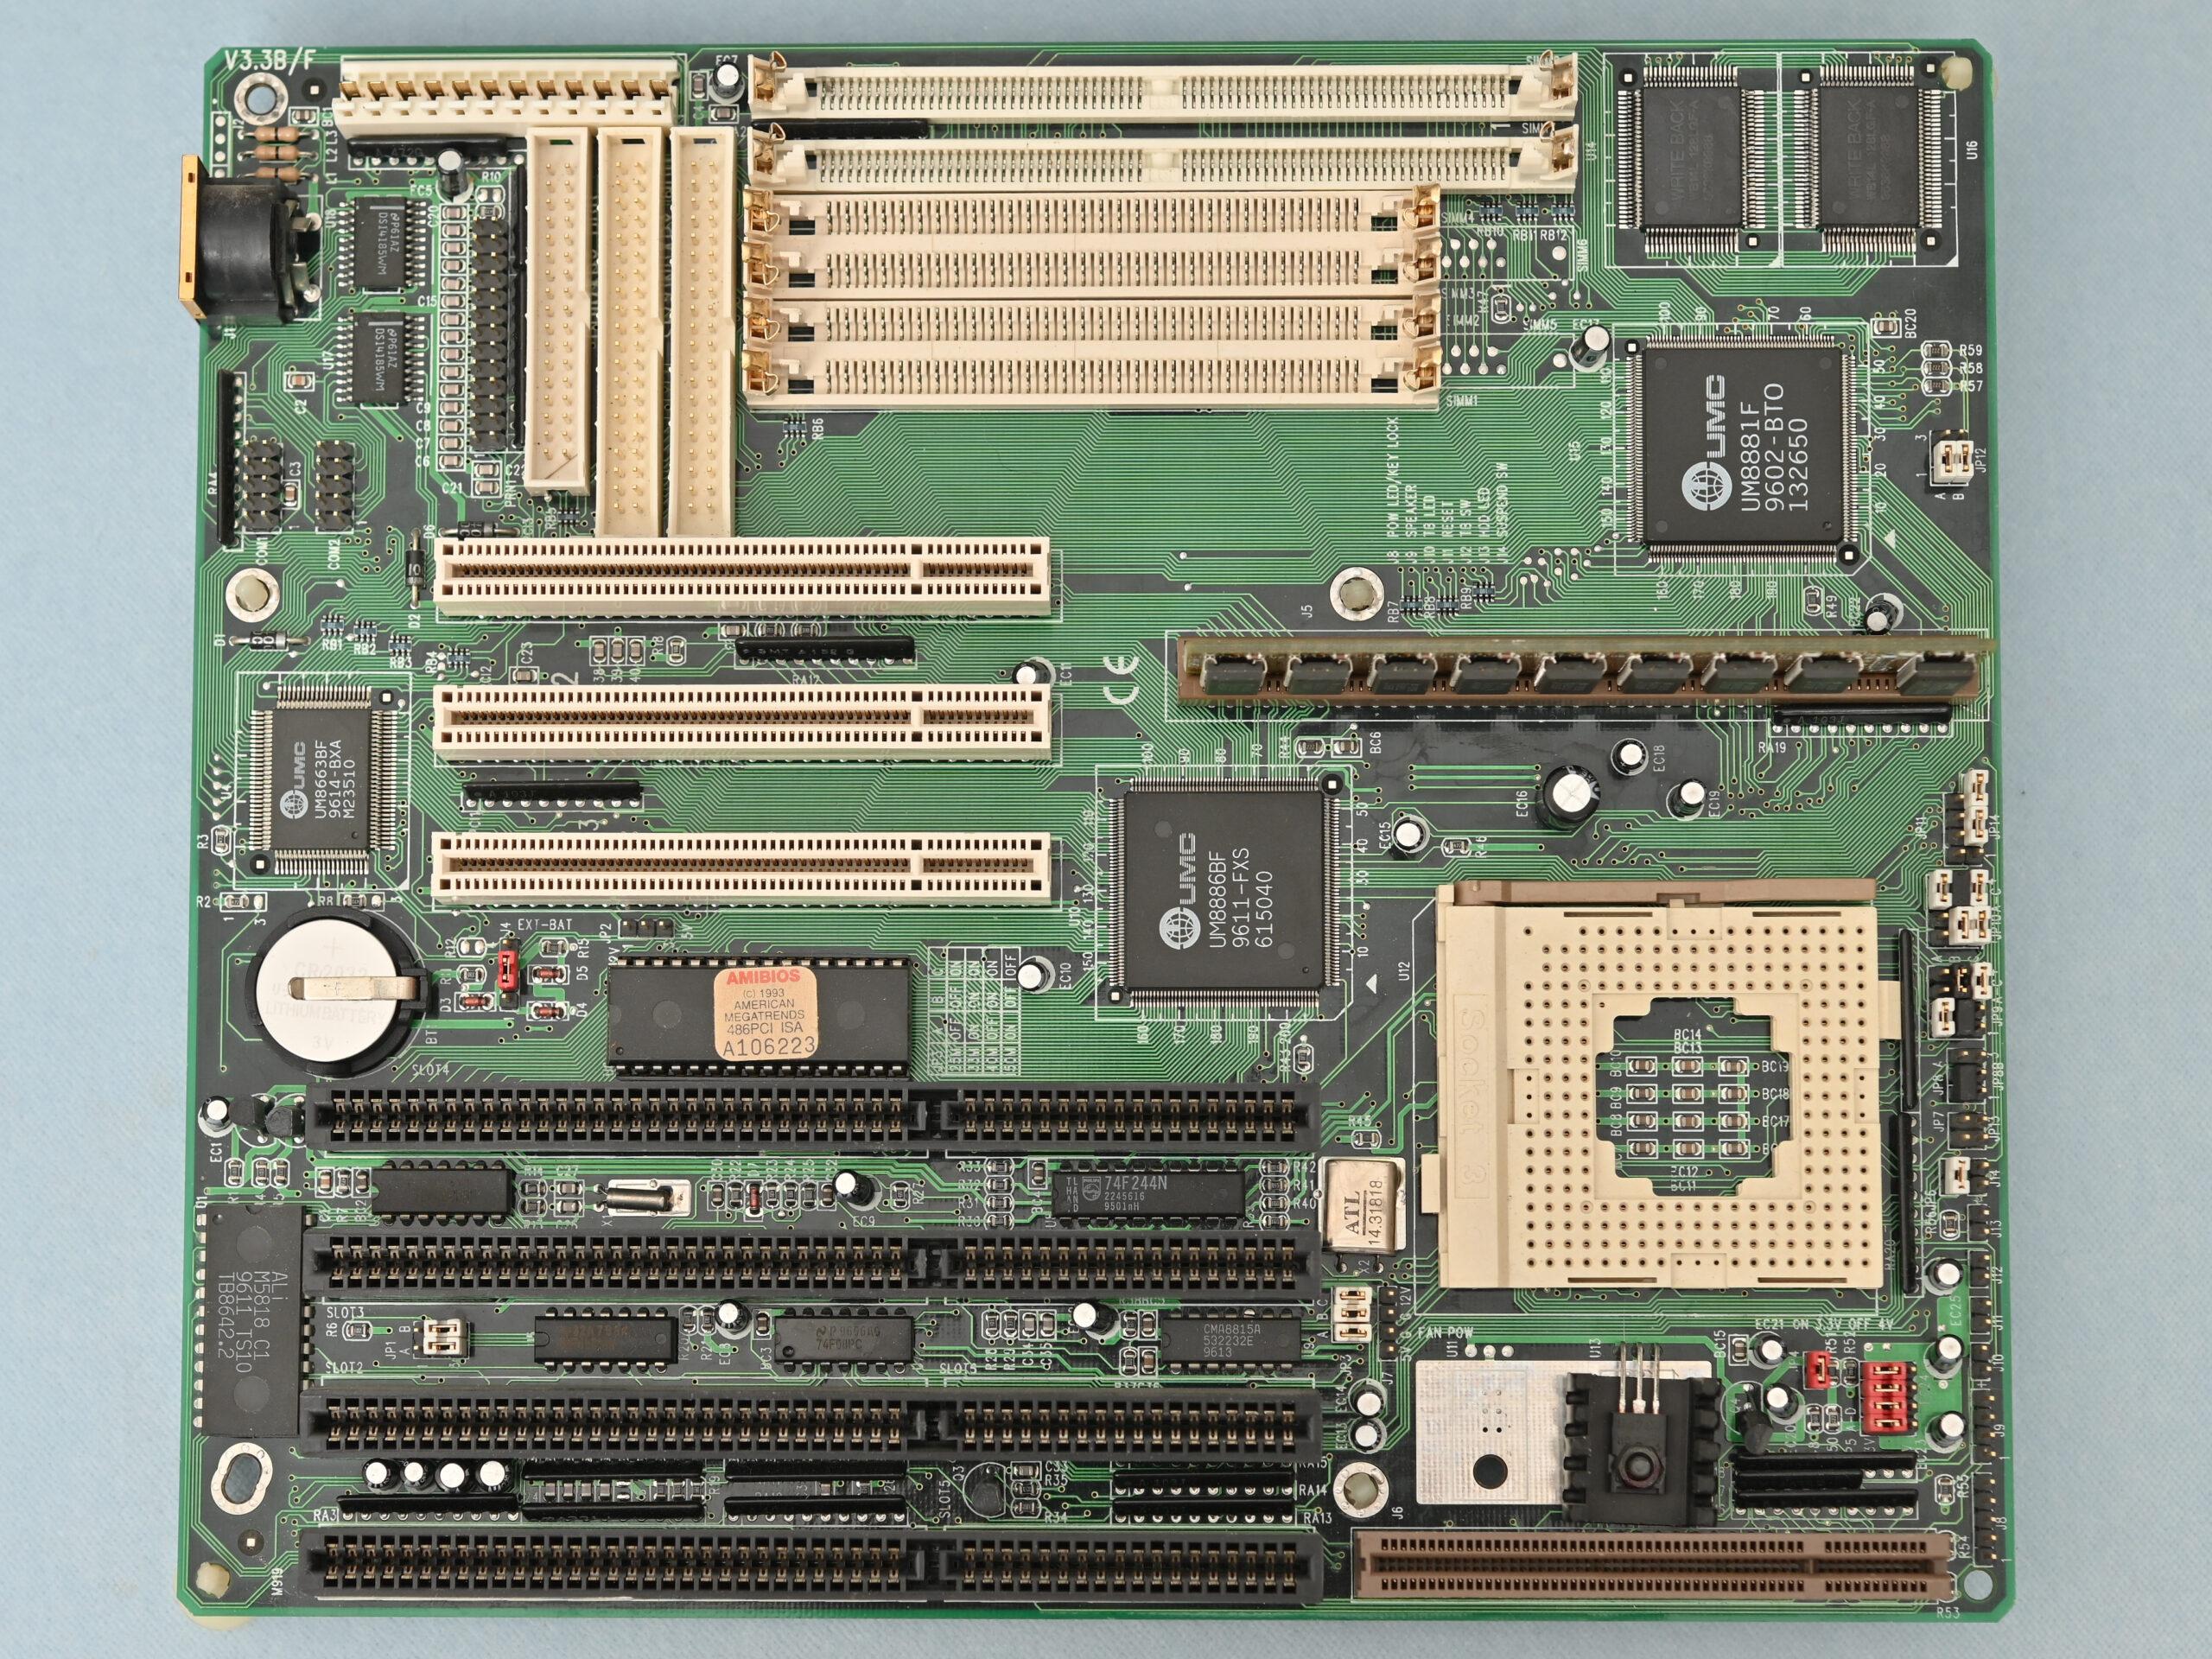 DSC_9939-scaled.jpeg